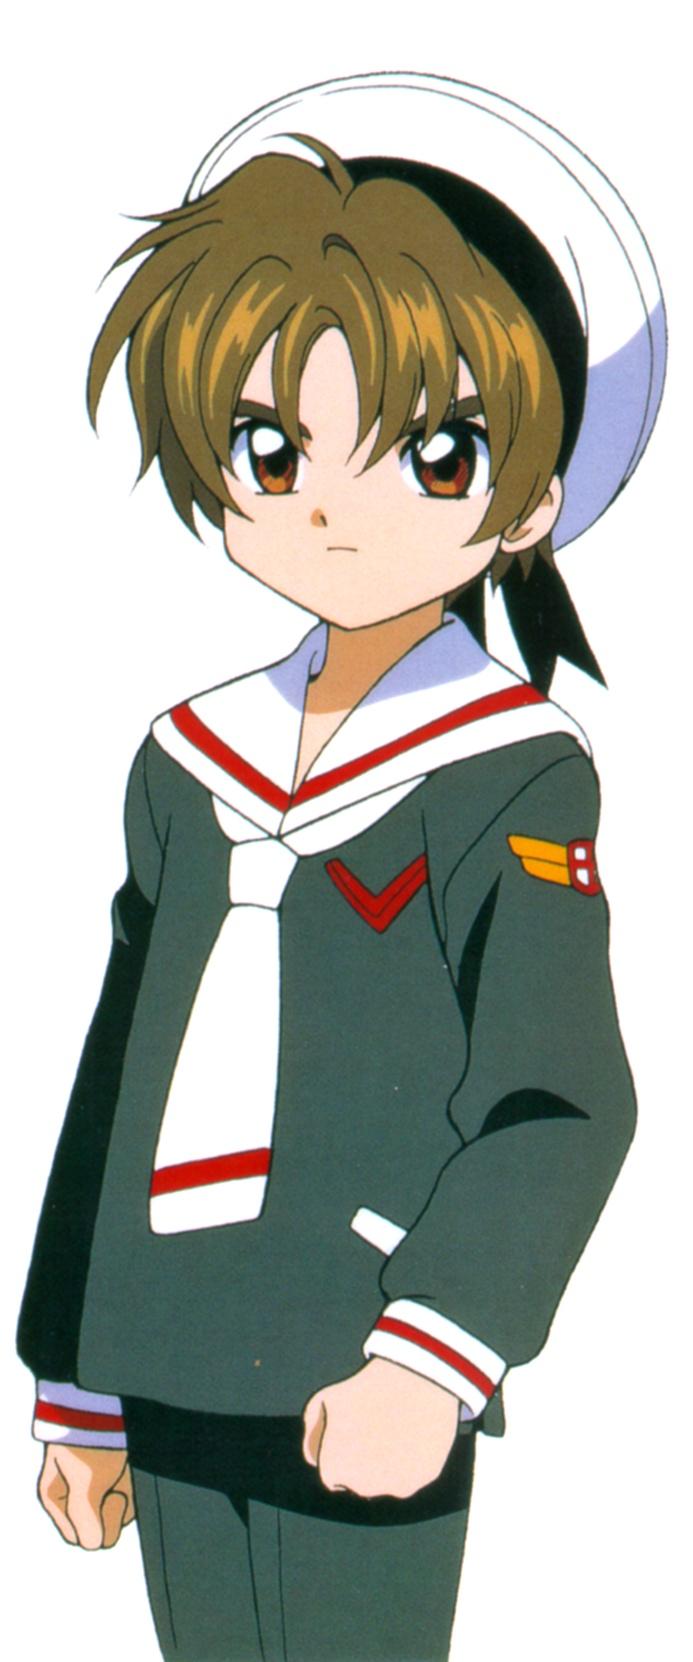 Image result for syaoran li cardcaptor sakura